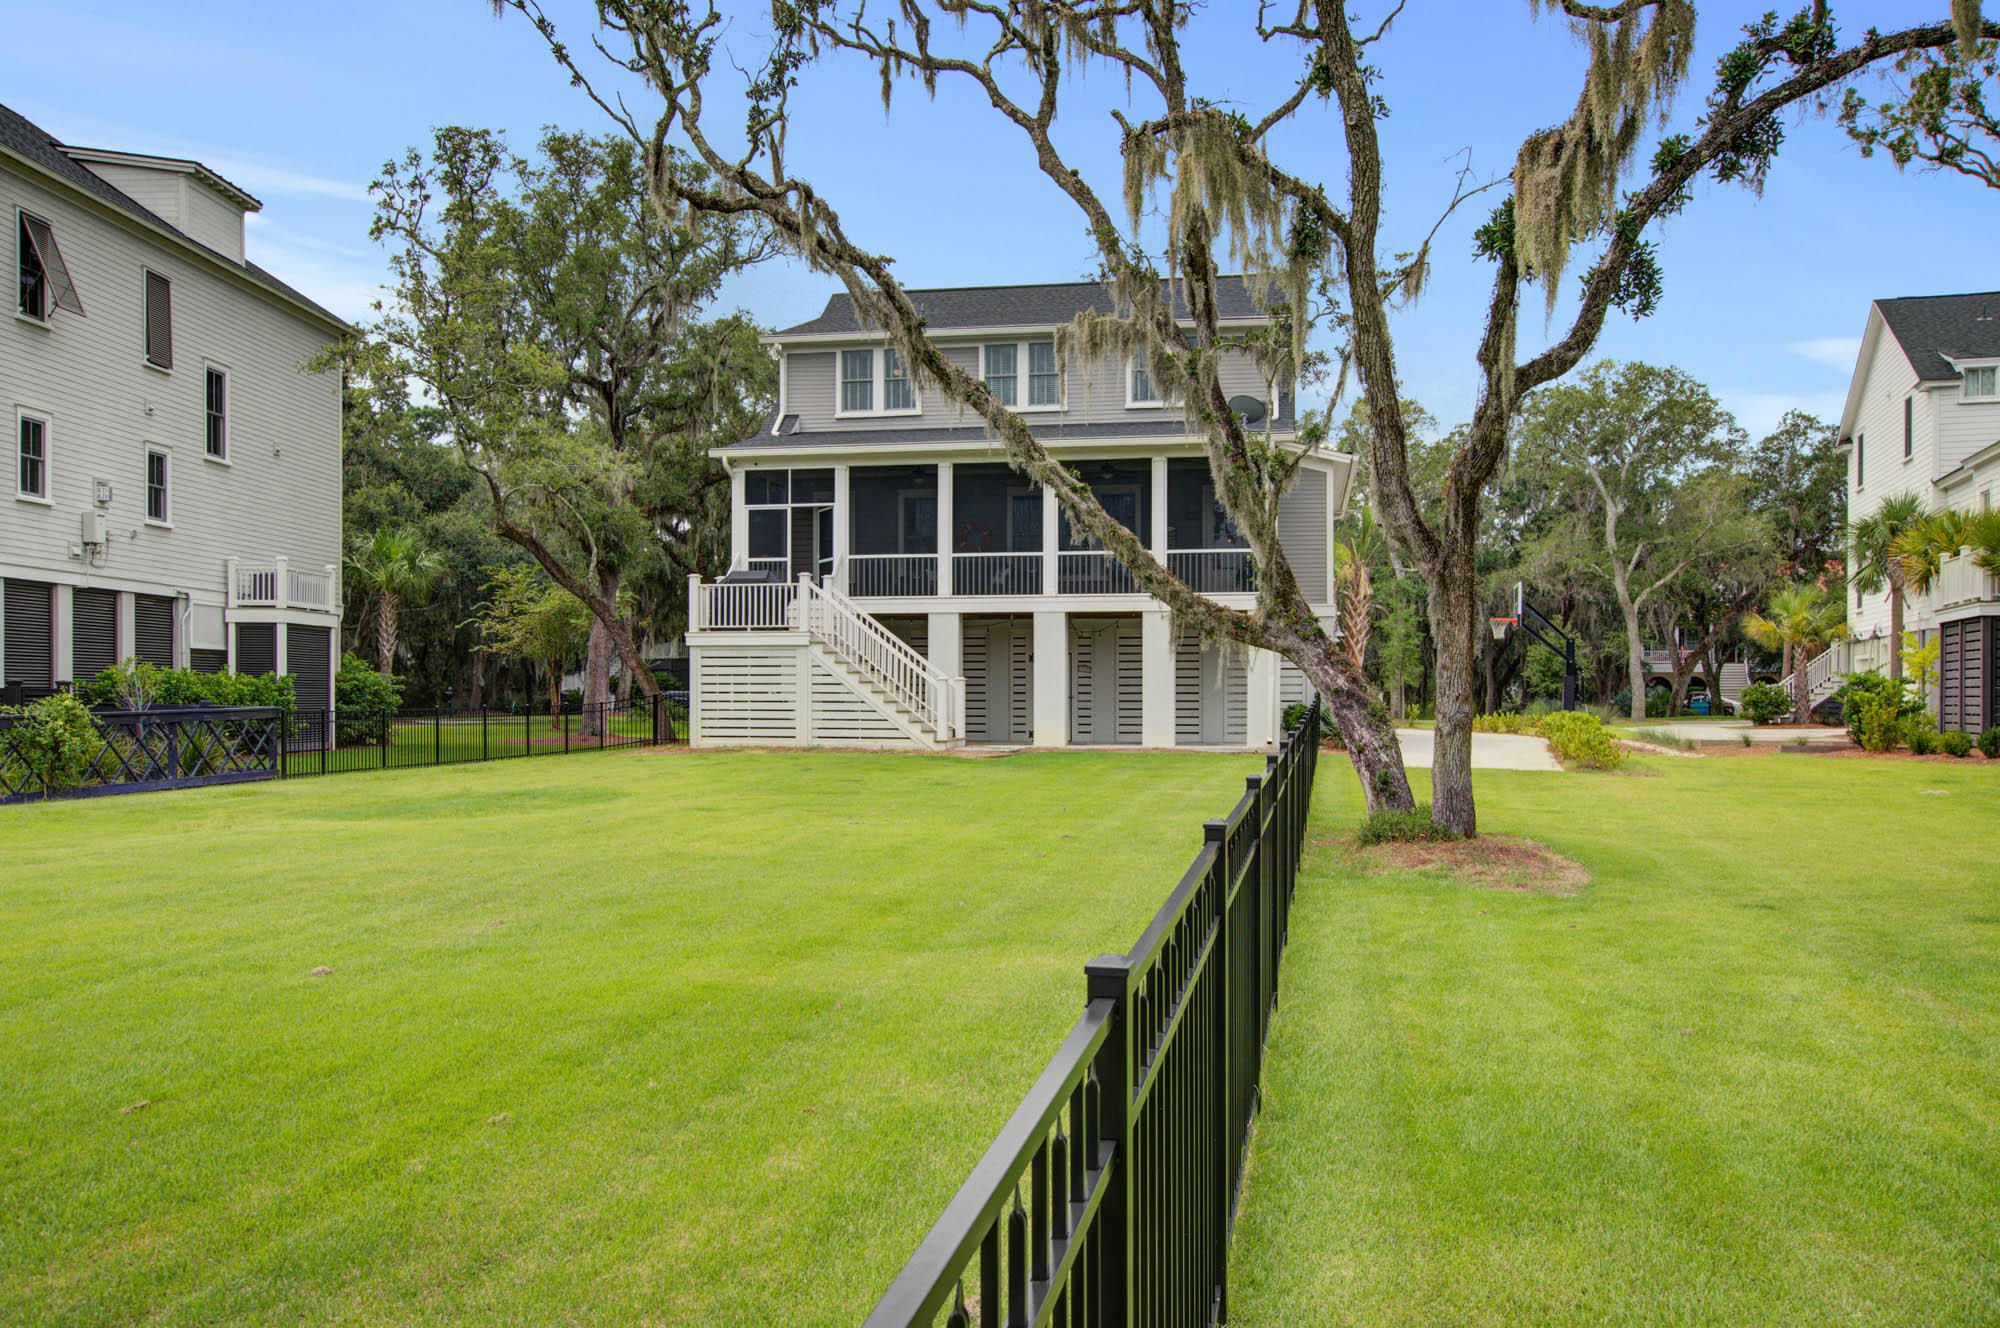 Headquarters Plantation Homes For Sale - 1872 Headquarters Plantation, Johns Island, SC - 48